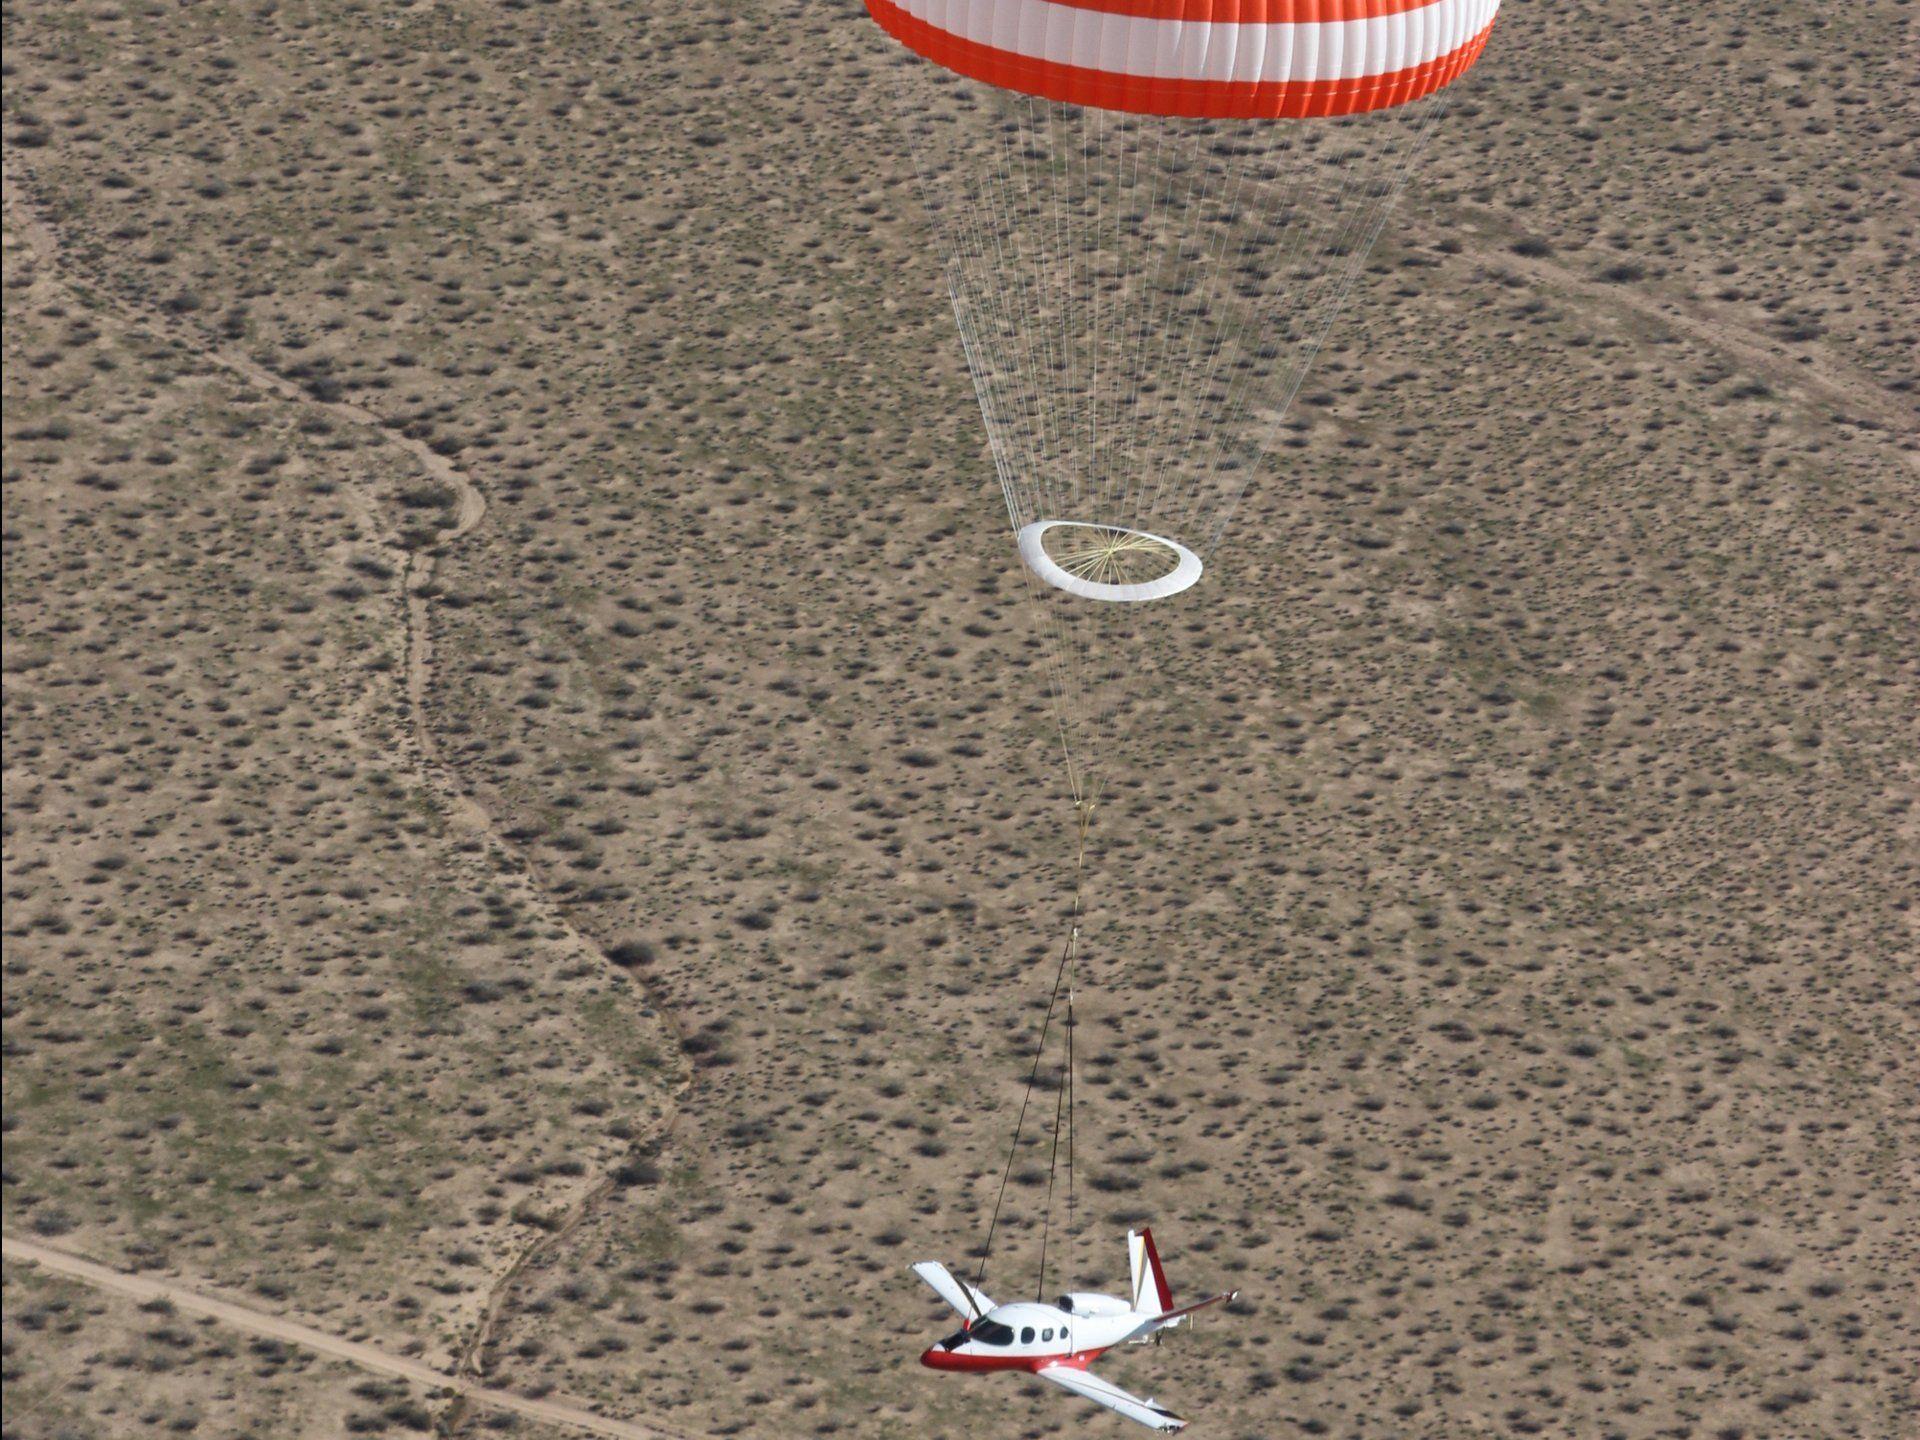 Cirrus Vision Jet Parachute system